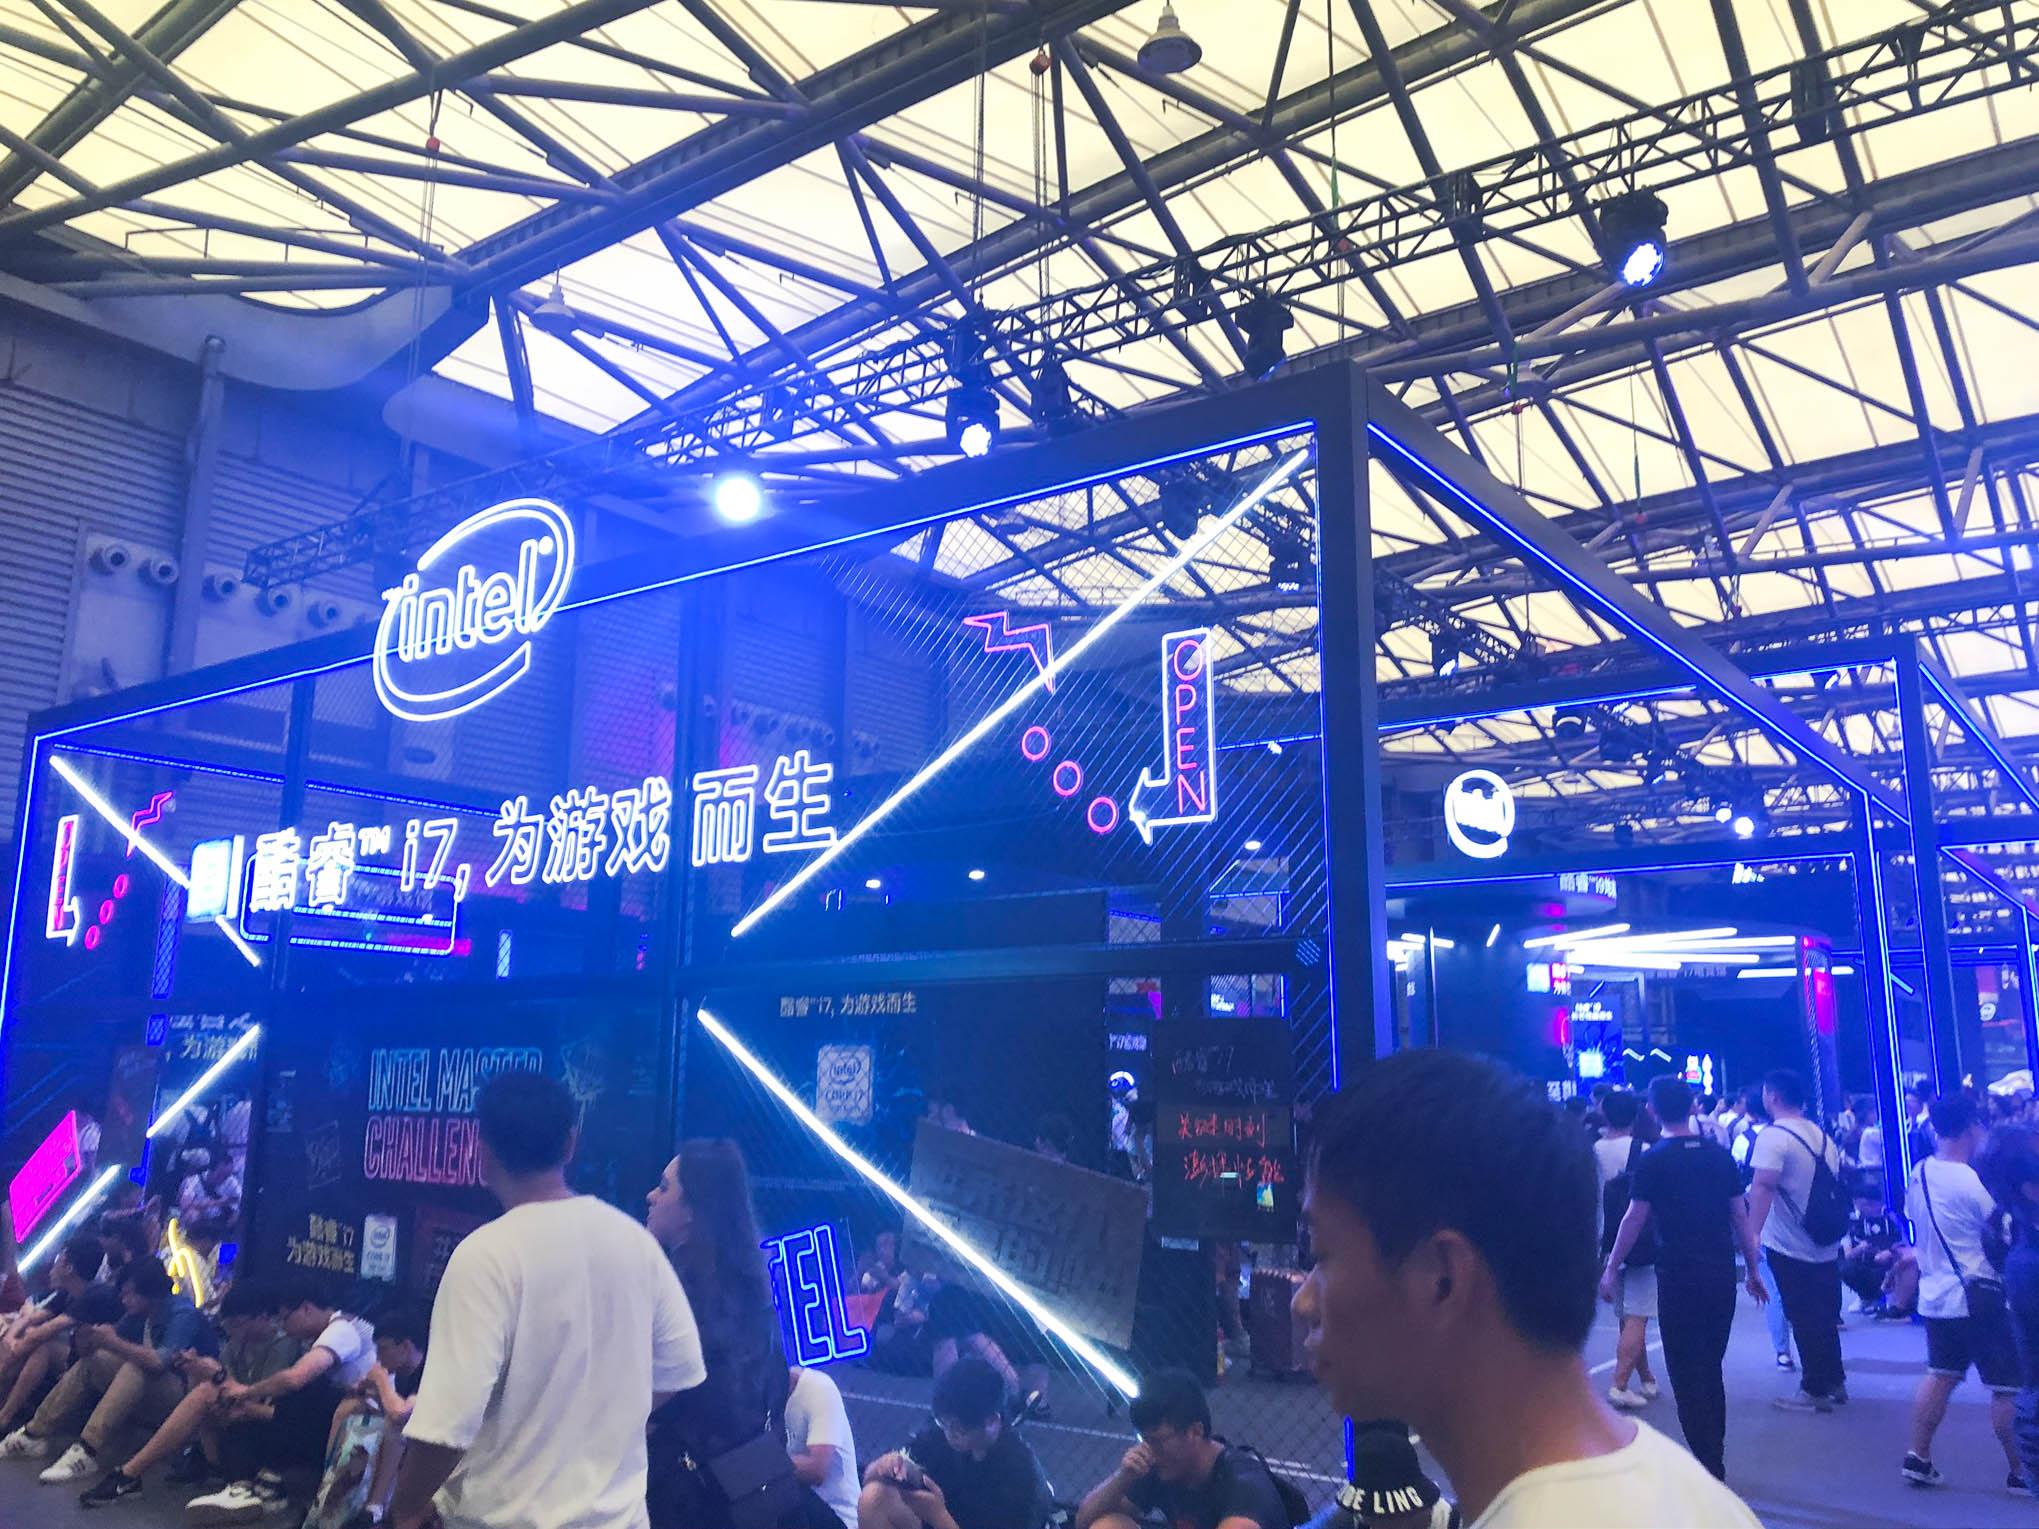 2019 ChinaJoy 中国国际数码互动娱乐展览会 游玩 第15张